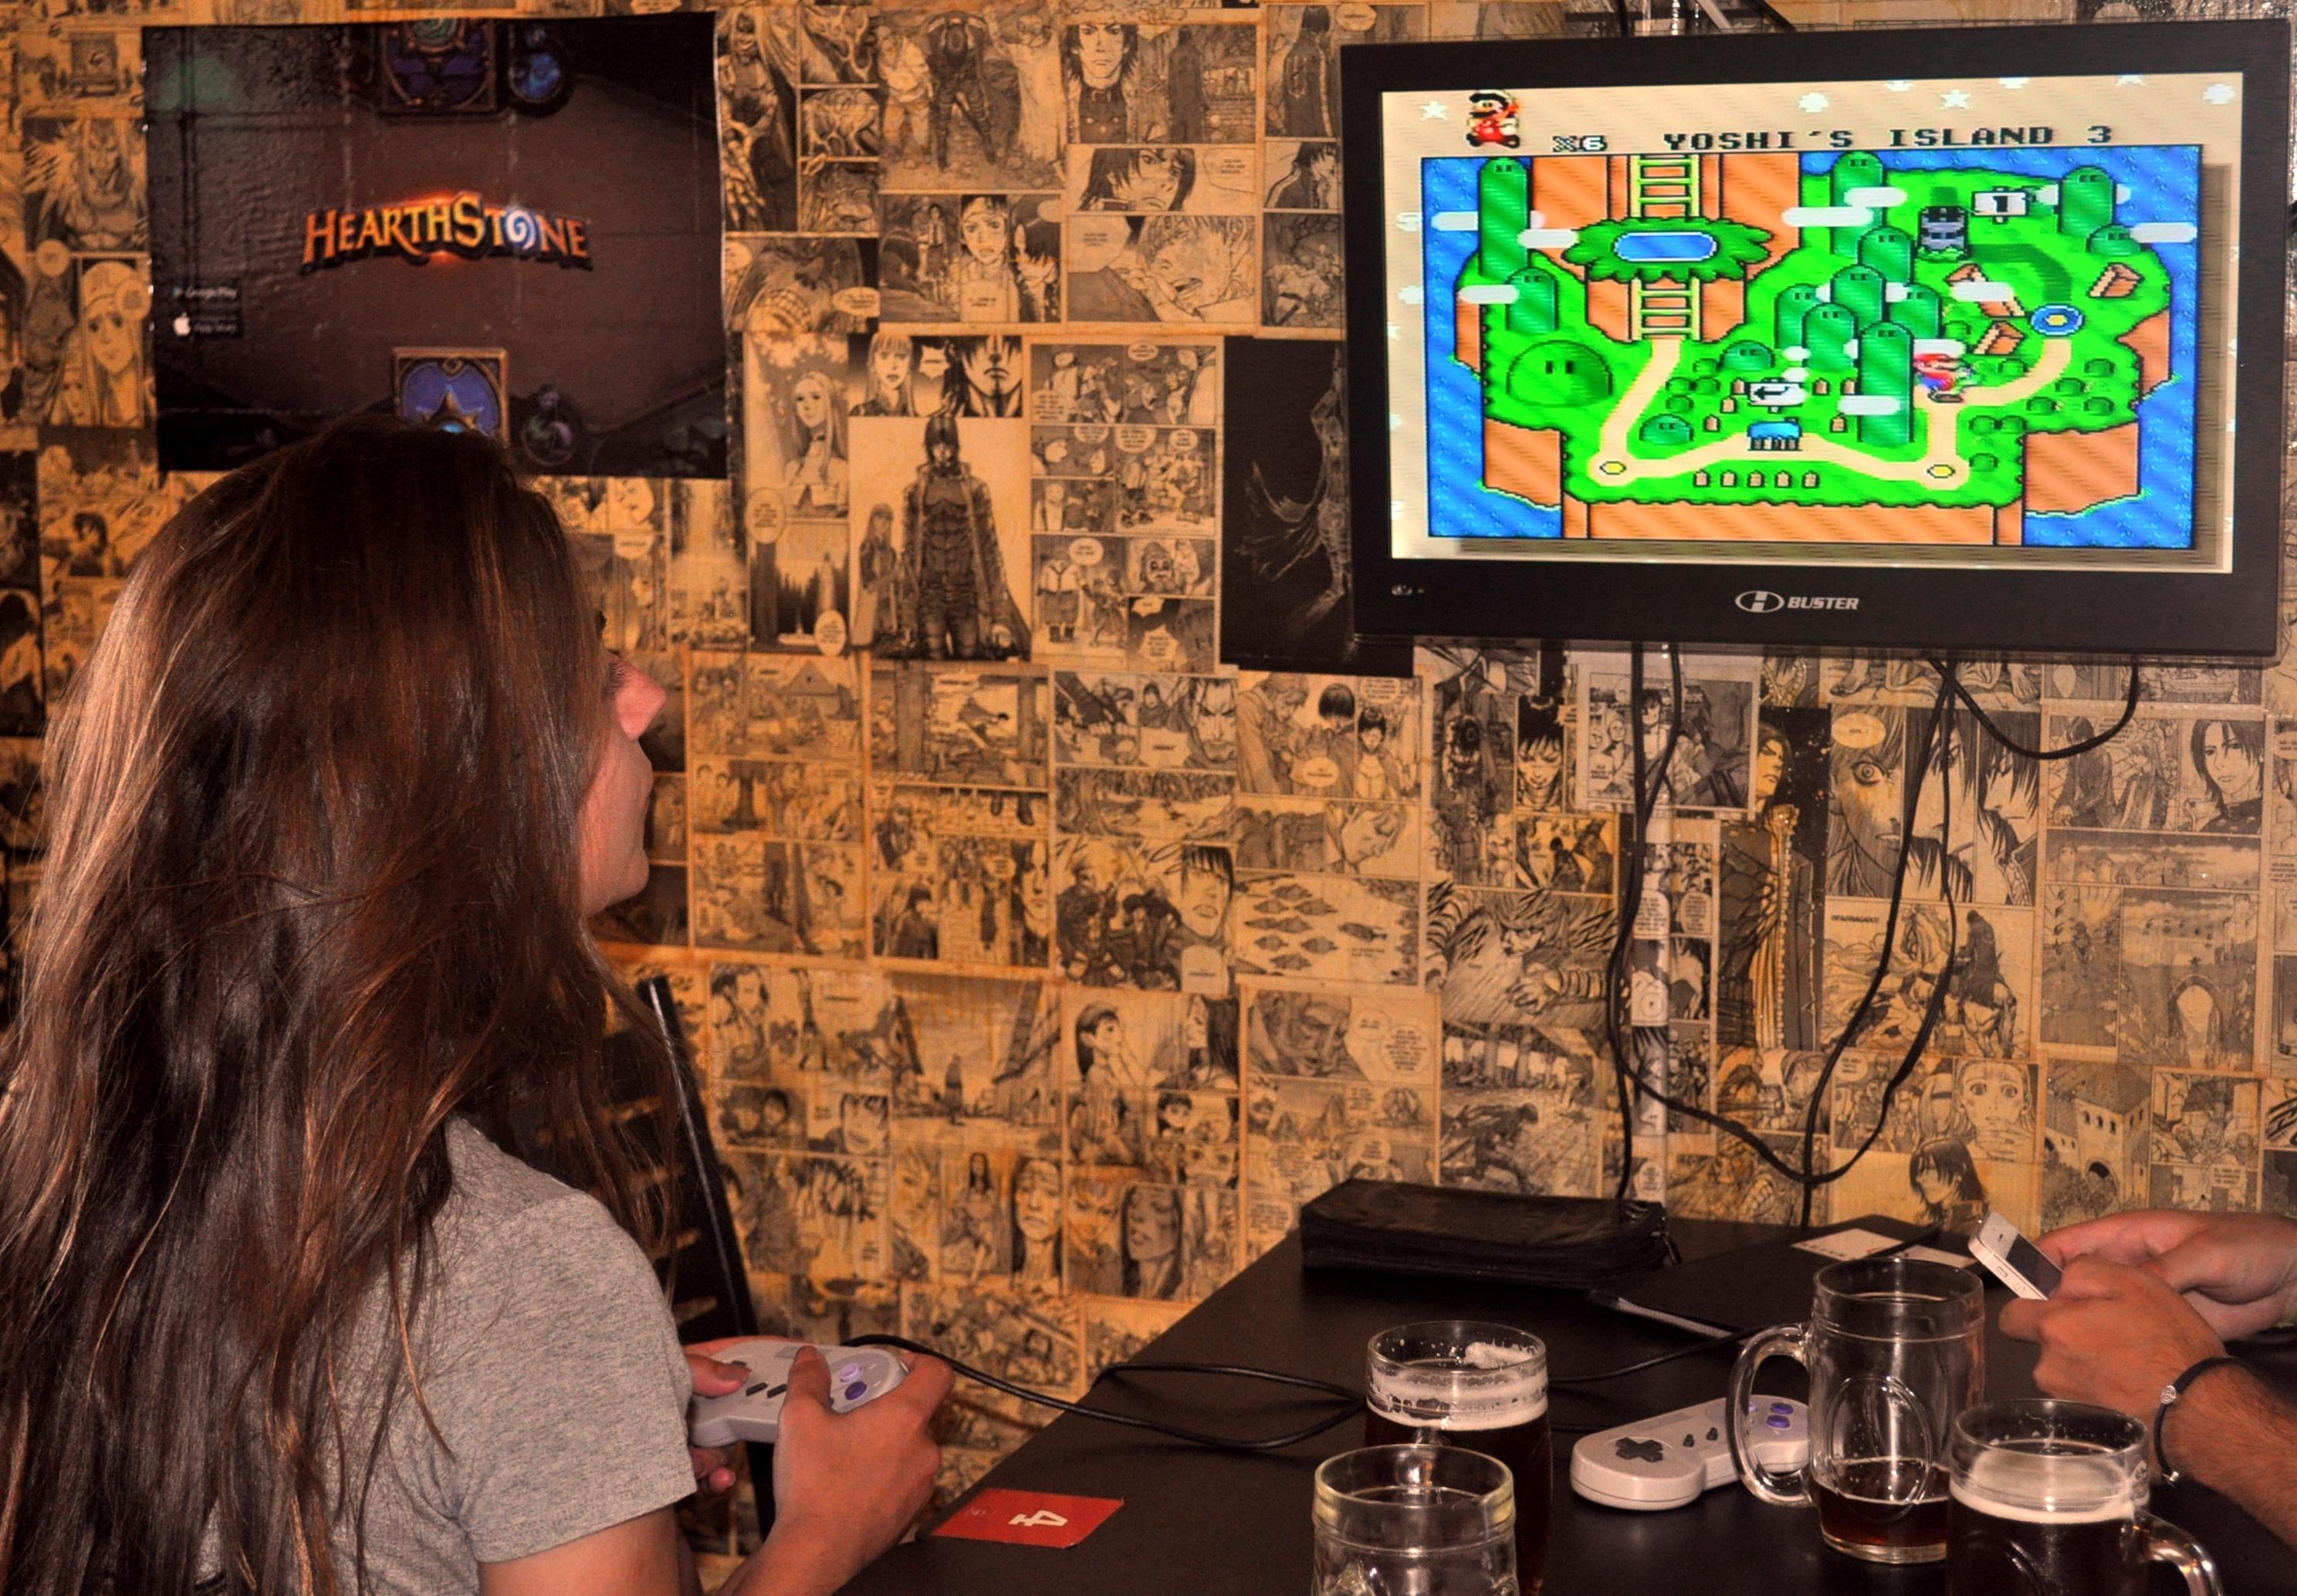 Geek Burguer - Jogue videogame enquanto aguarda o seu lanche!